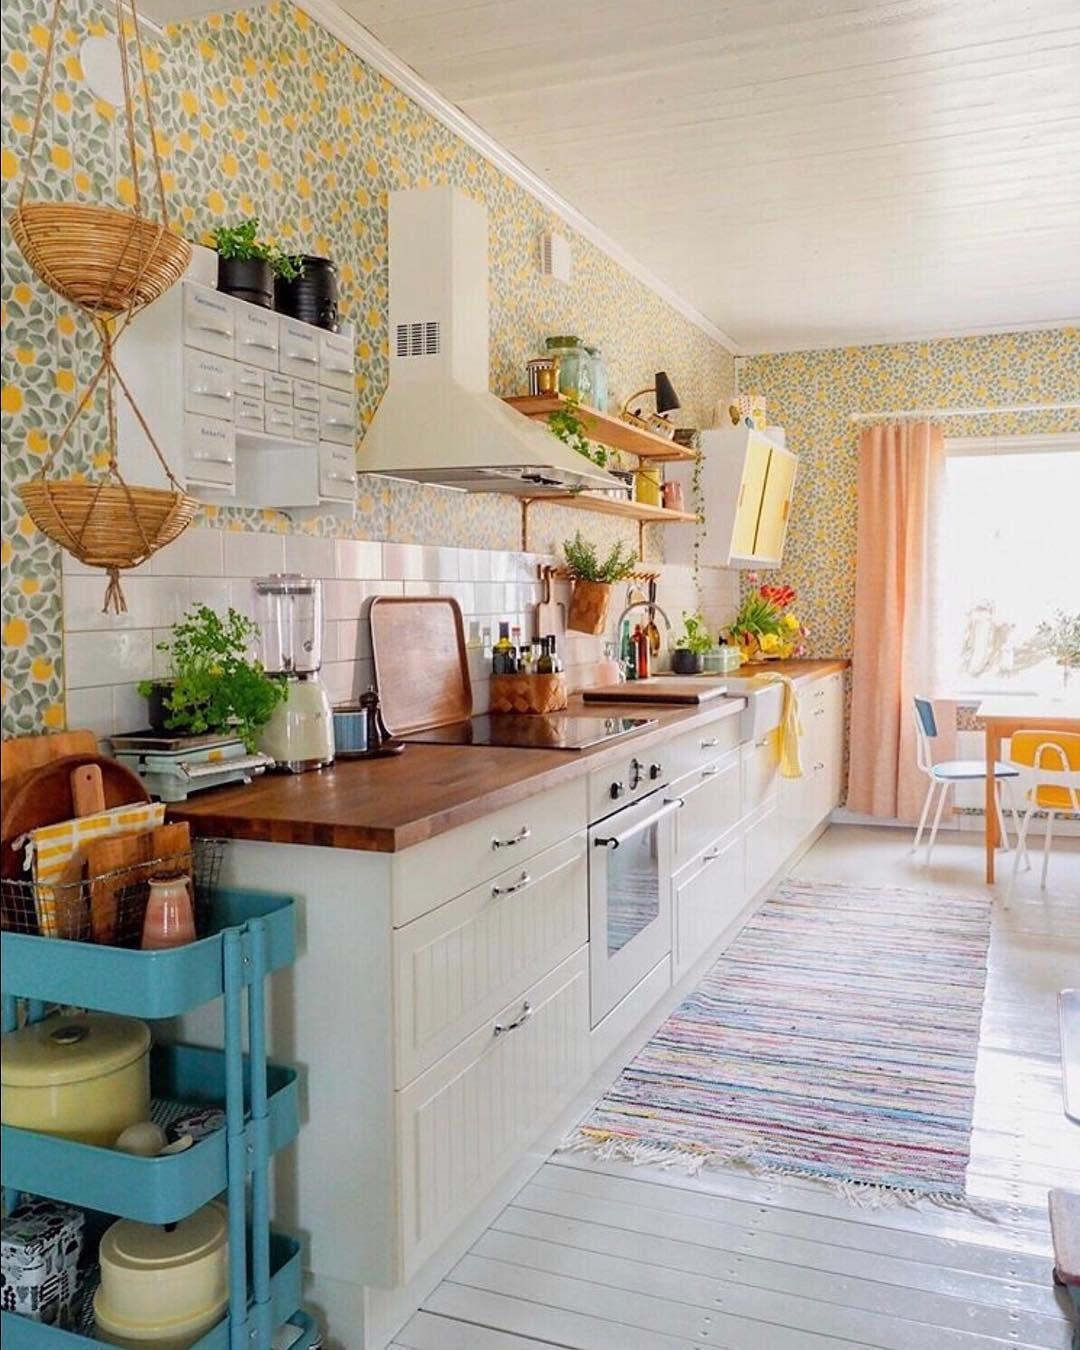 prepossessing design ideas for boho style kitchens interior design kitchen kitchen interior on boho chic kitchen diy id=92686